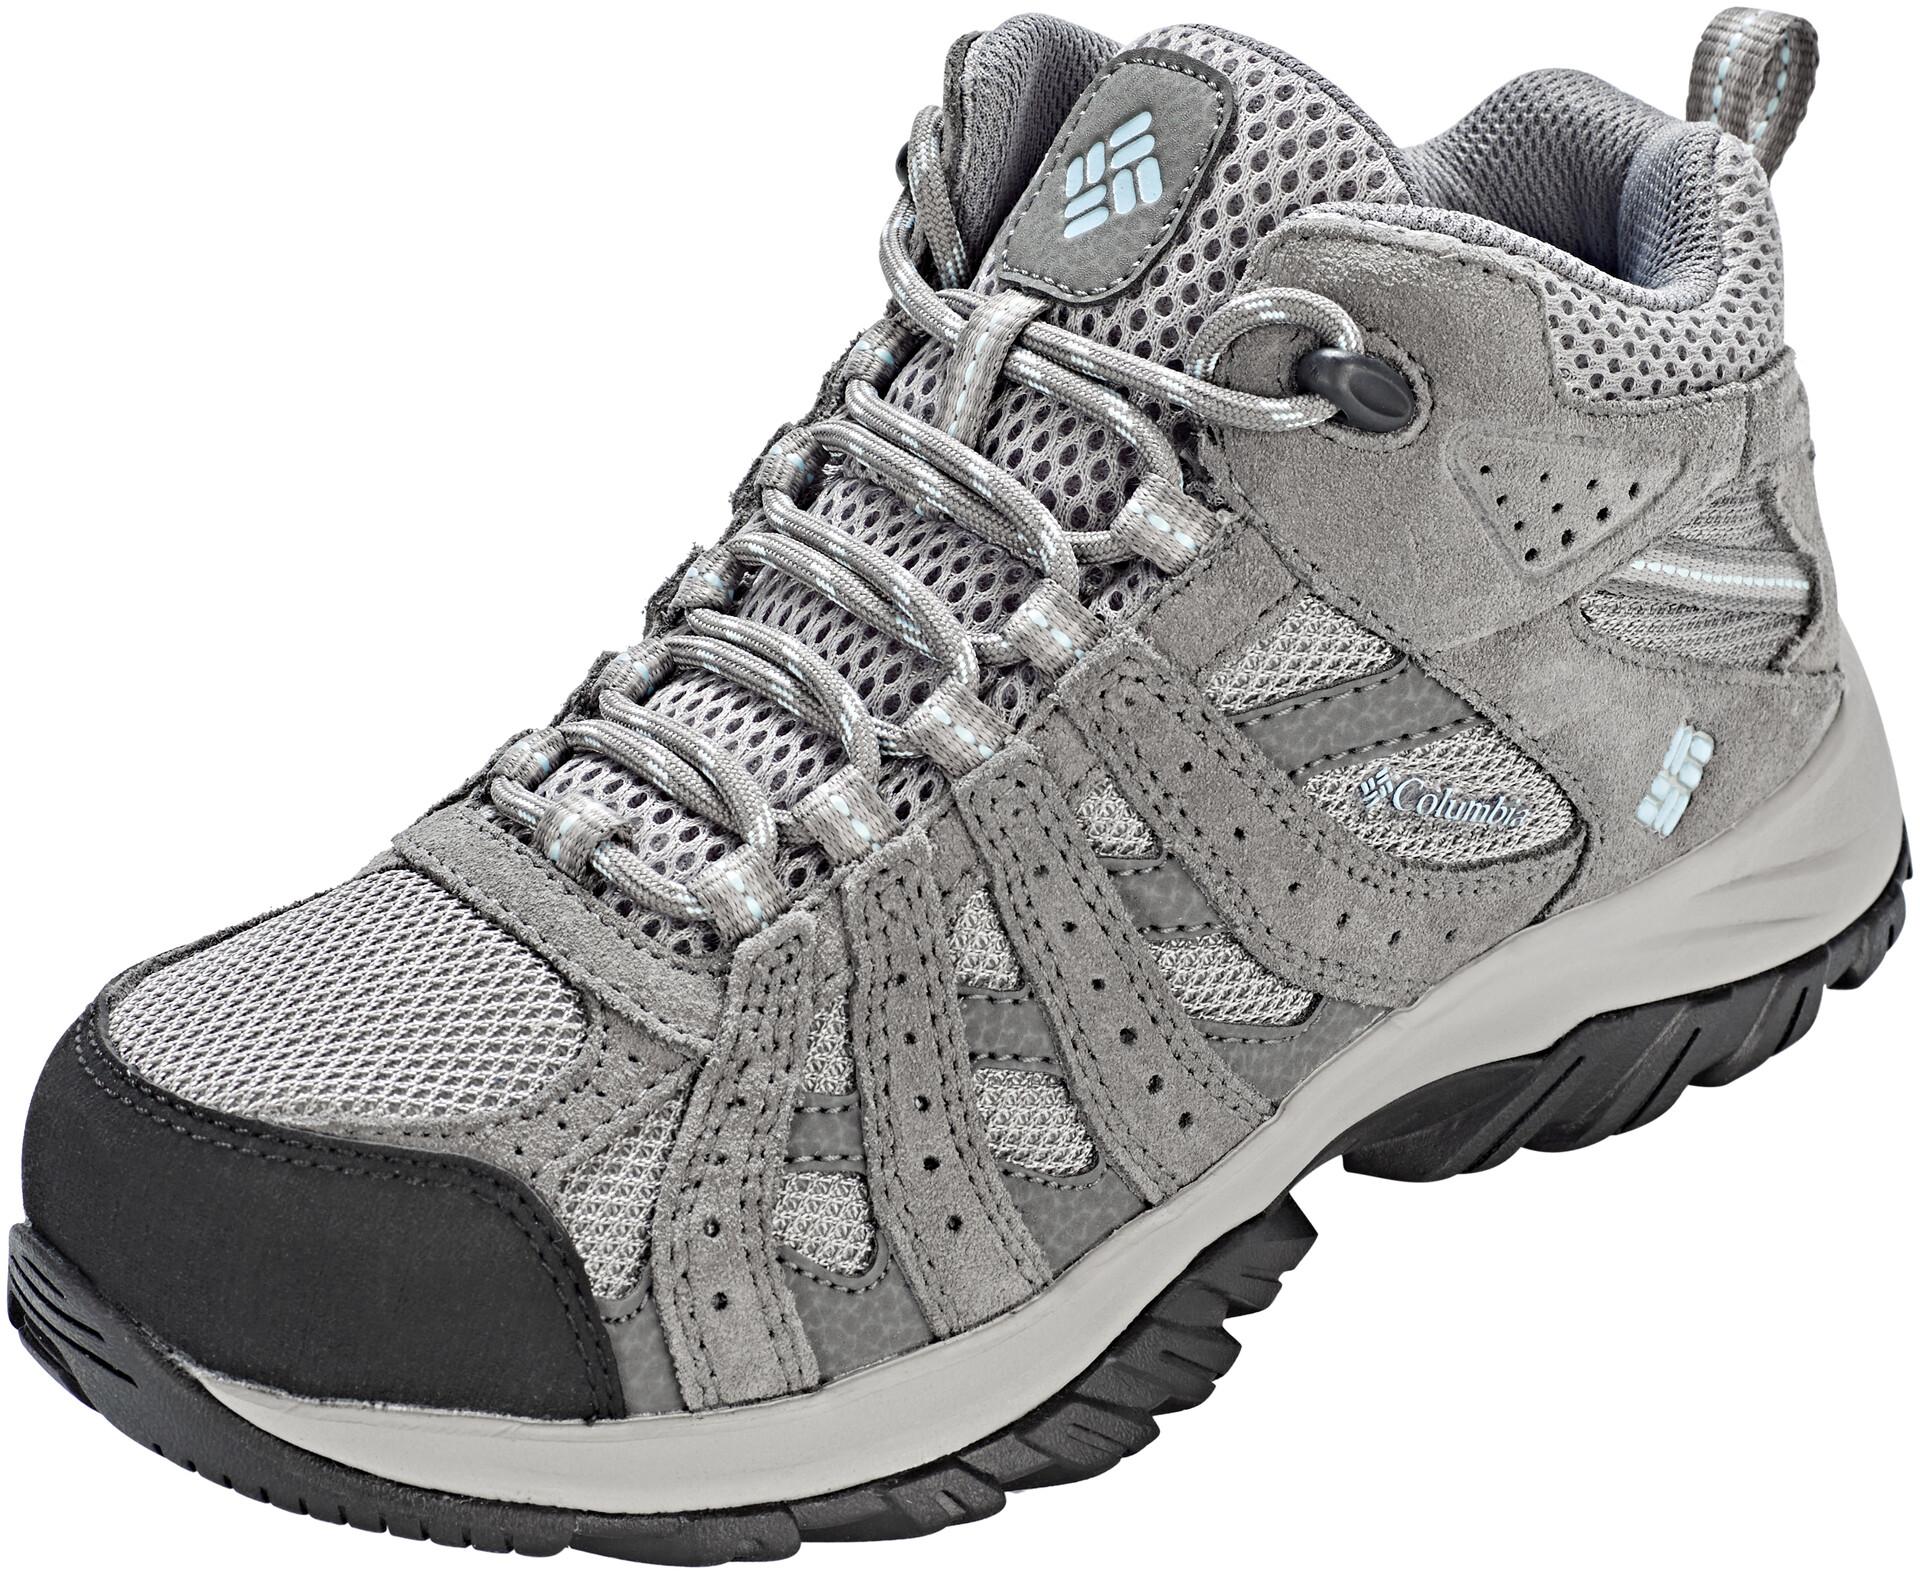 Chaussures Xt Greyoxygen Columbia FemmeLight Waterproof Mid Redmond xWrCQeodB